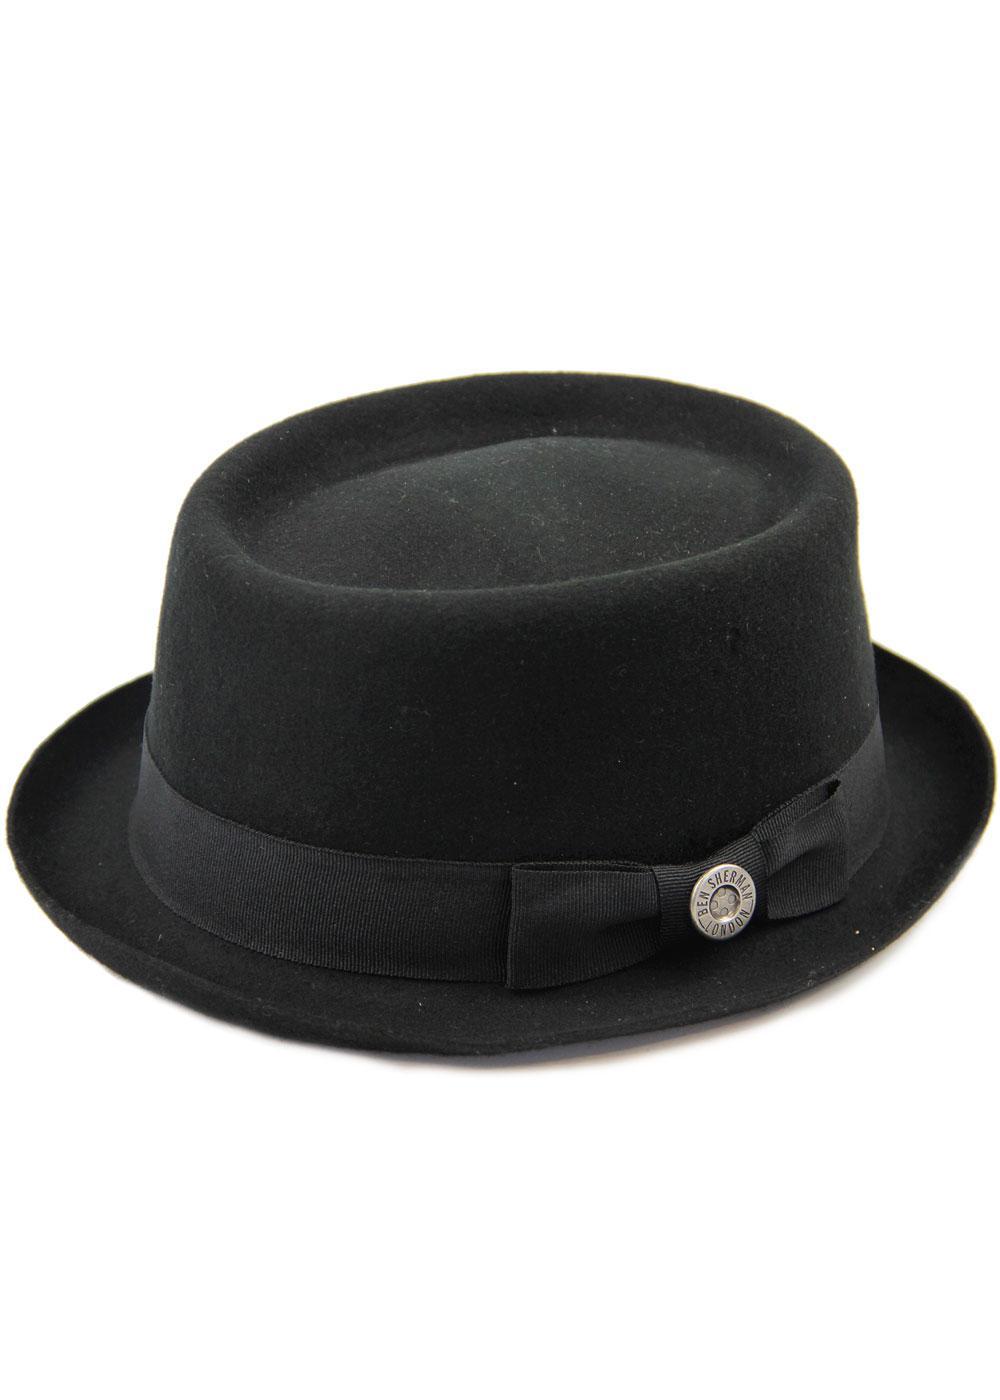 BEN SHERMAN Retro 60s Mod Wool Felt Pork Pie Hat in Black 47cad695644